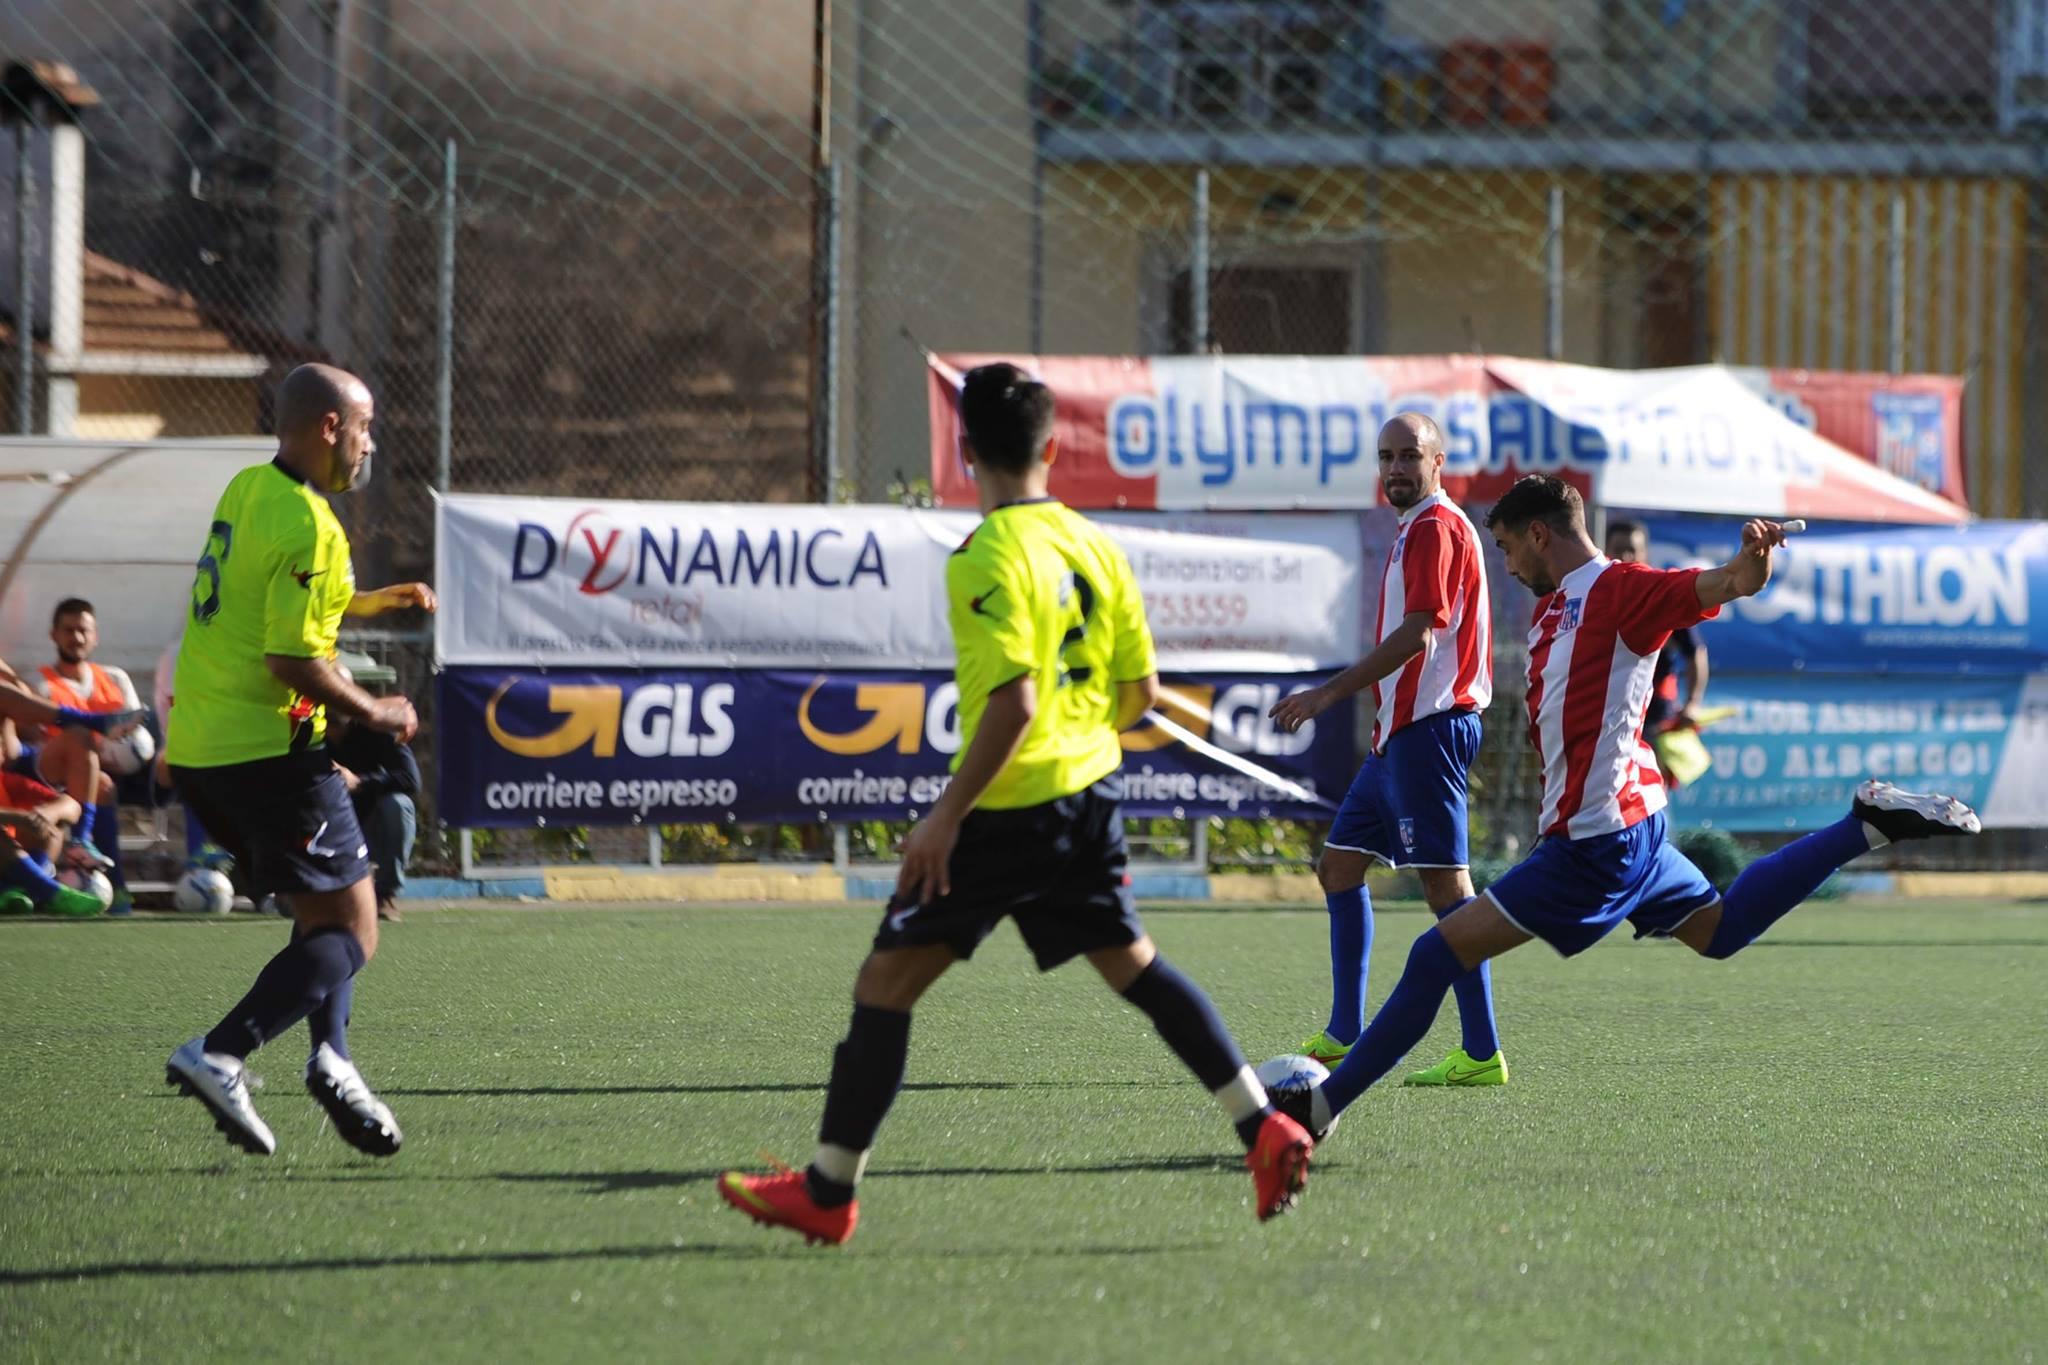 Olympic Salerno - Fisciano 2-0